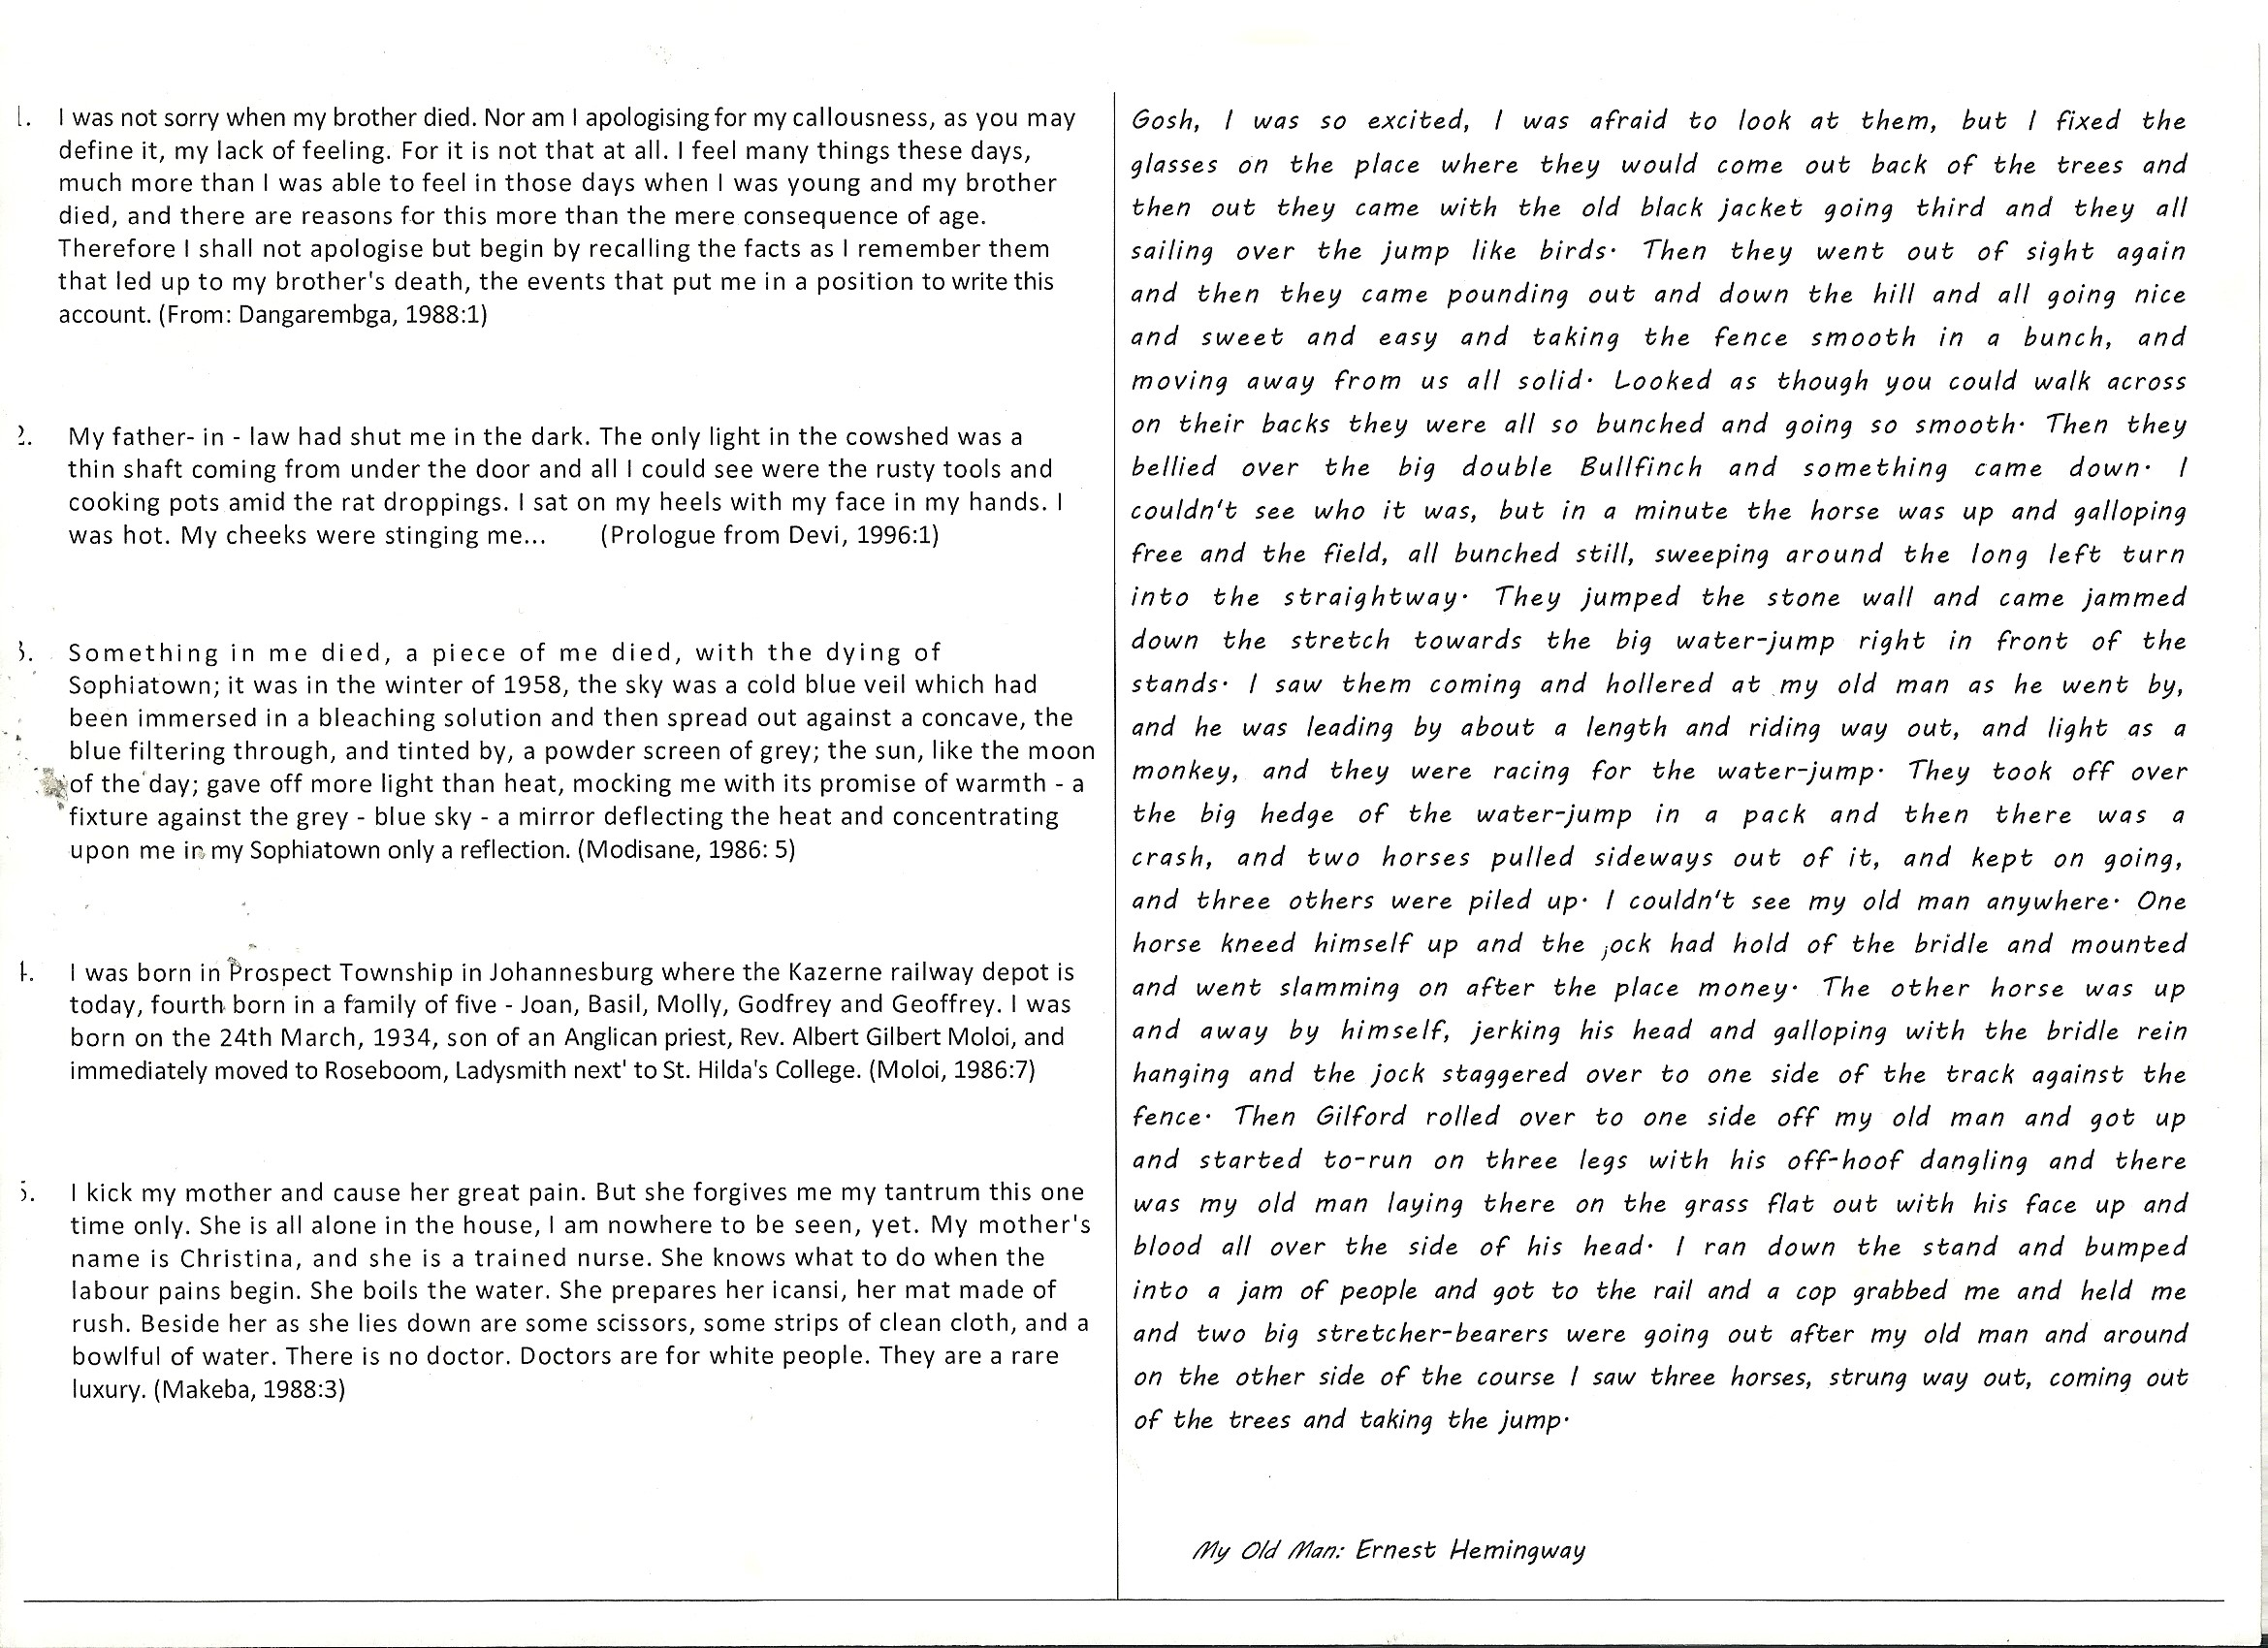 016 Ideas For Narrative Essay Example Good Vs Beautiful A Fictional Writing Personal Descriptive Full